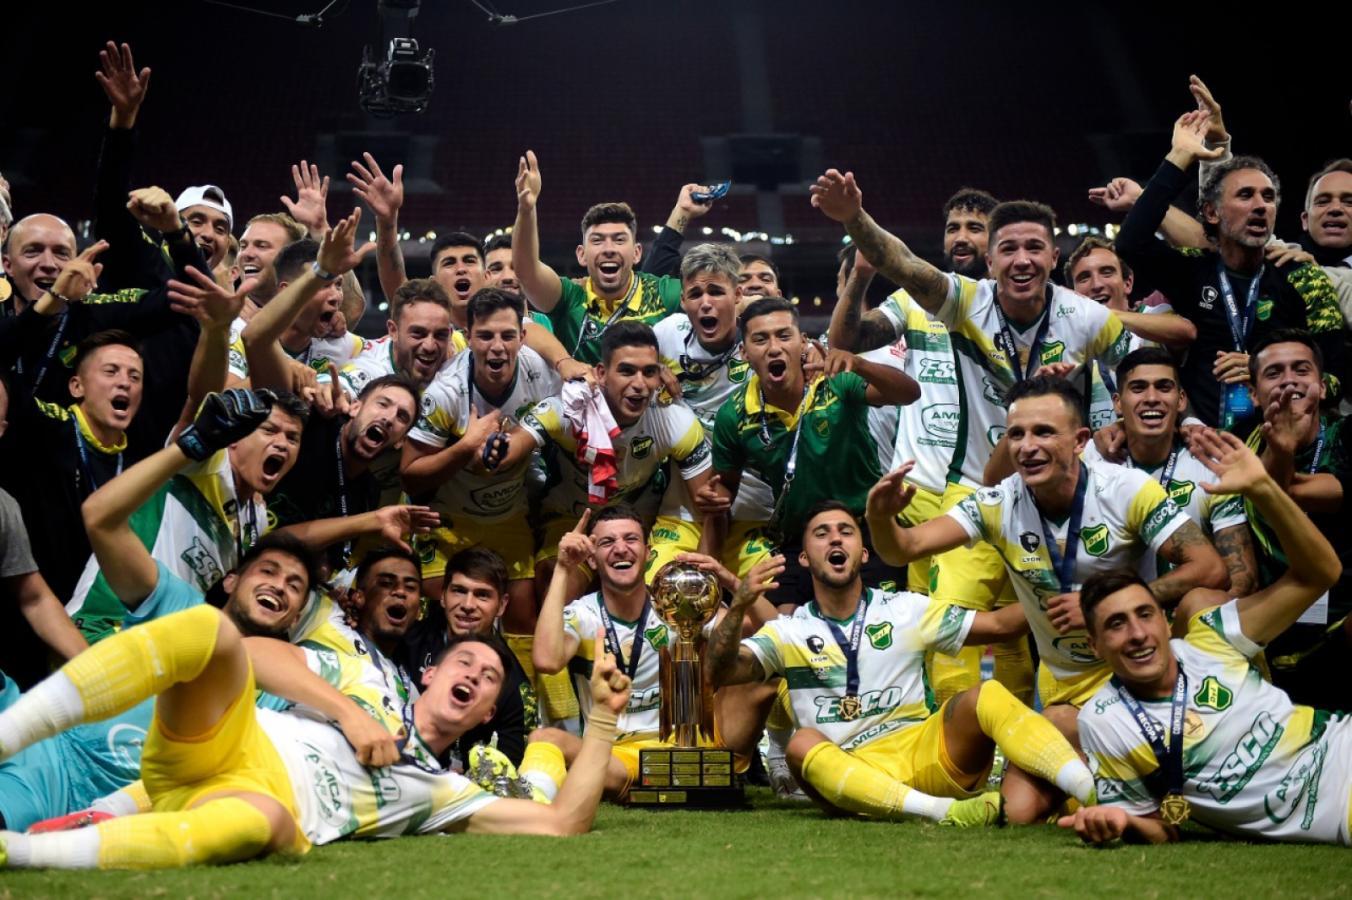 La foto con la Copa. CONMEBOL